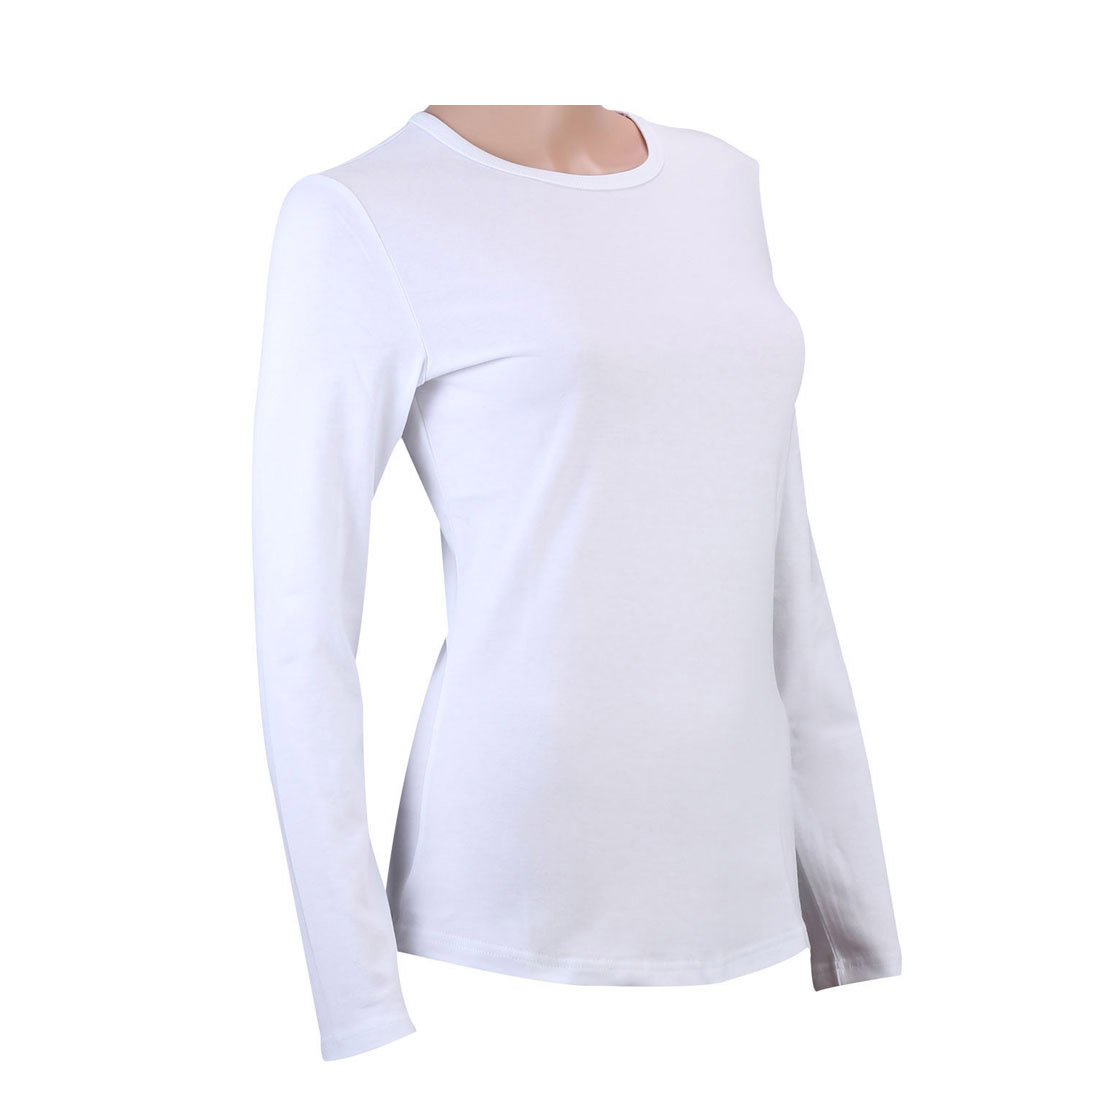 100% Cotton Womens V Neck Crew Neck Long Sleeve T-Shirt Plain ...